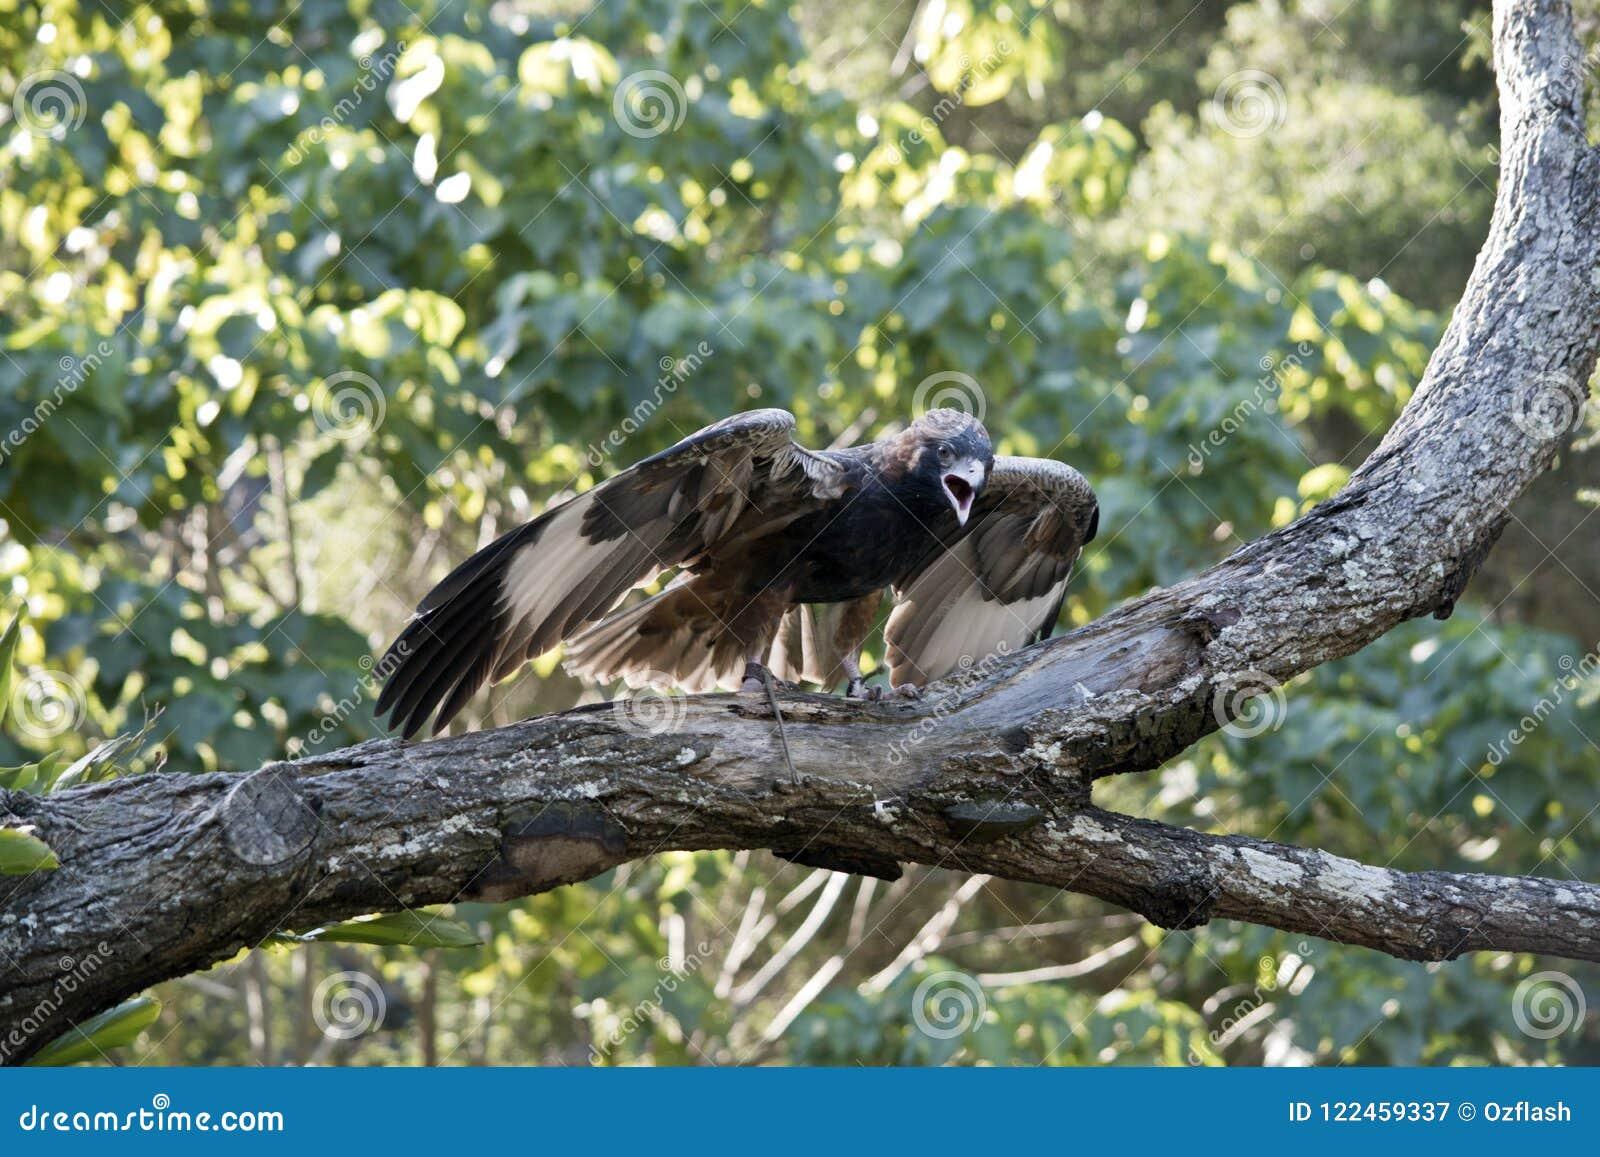 A black breasted buzzard